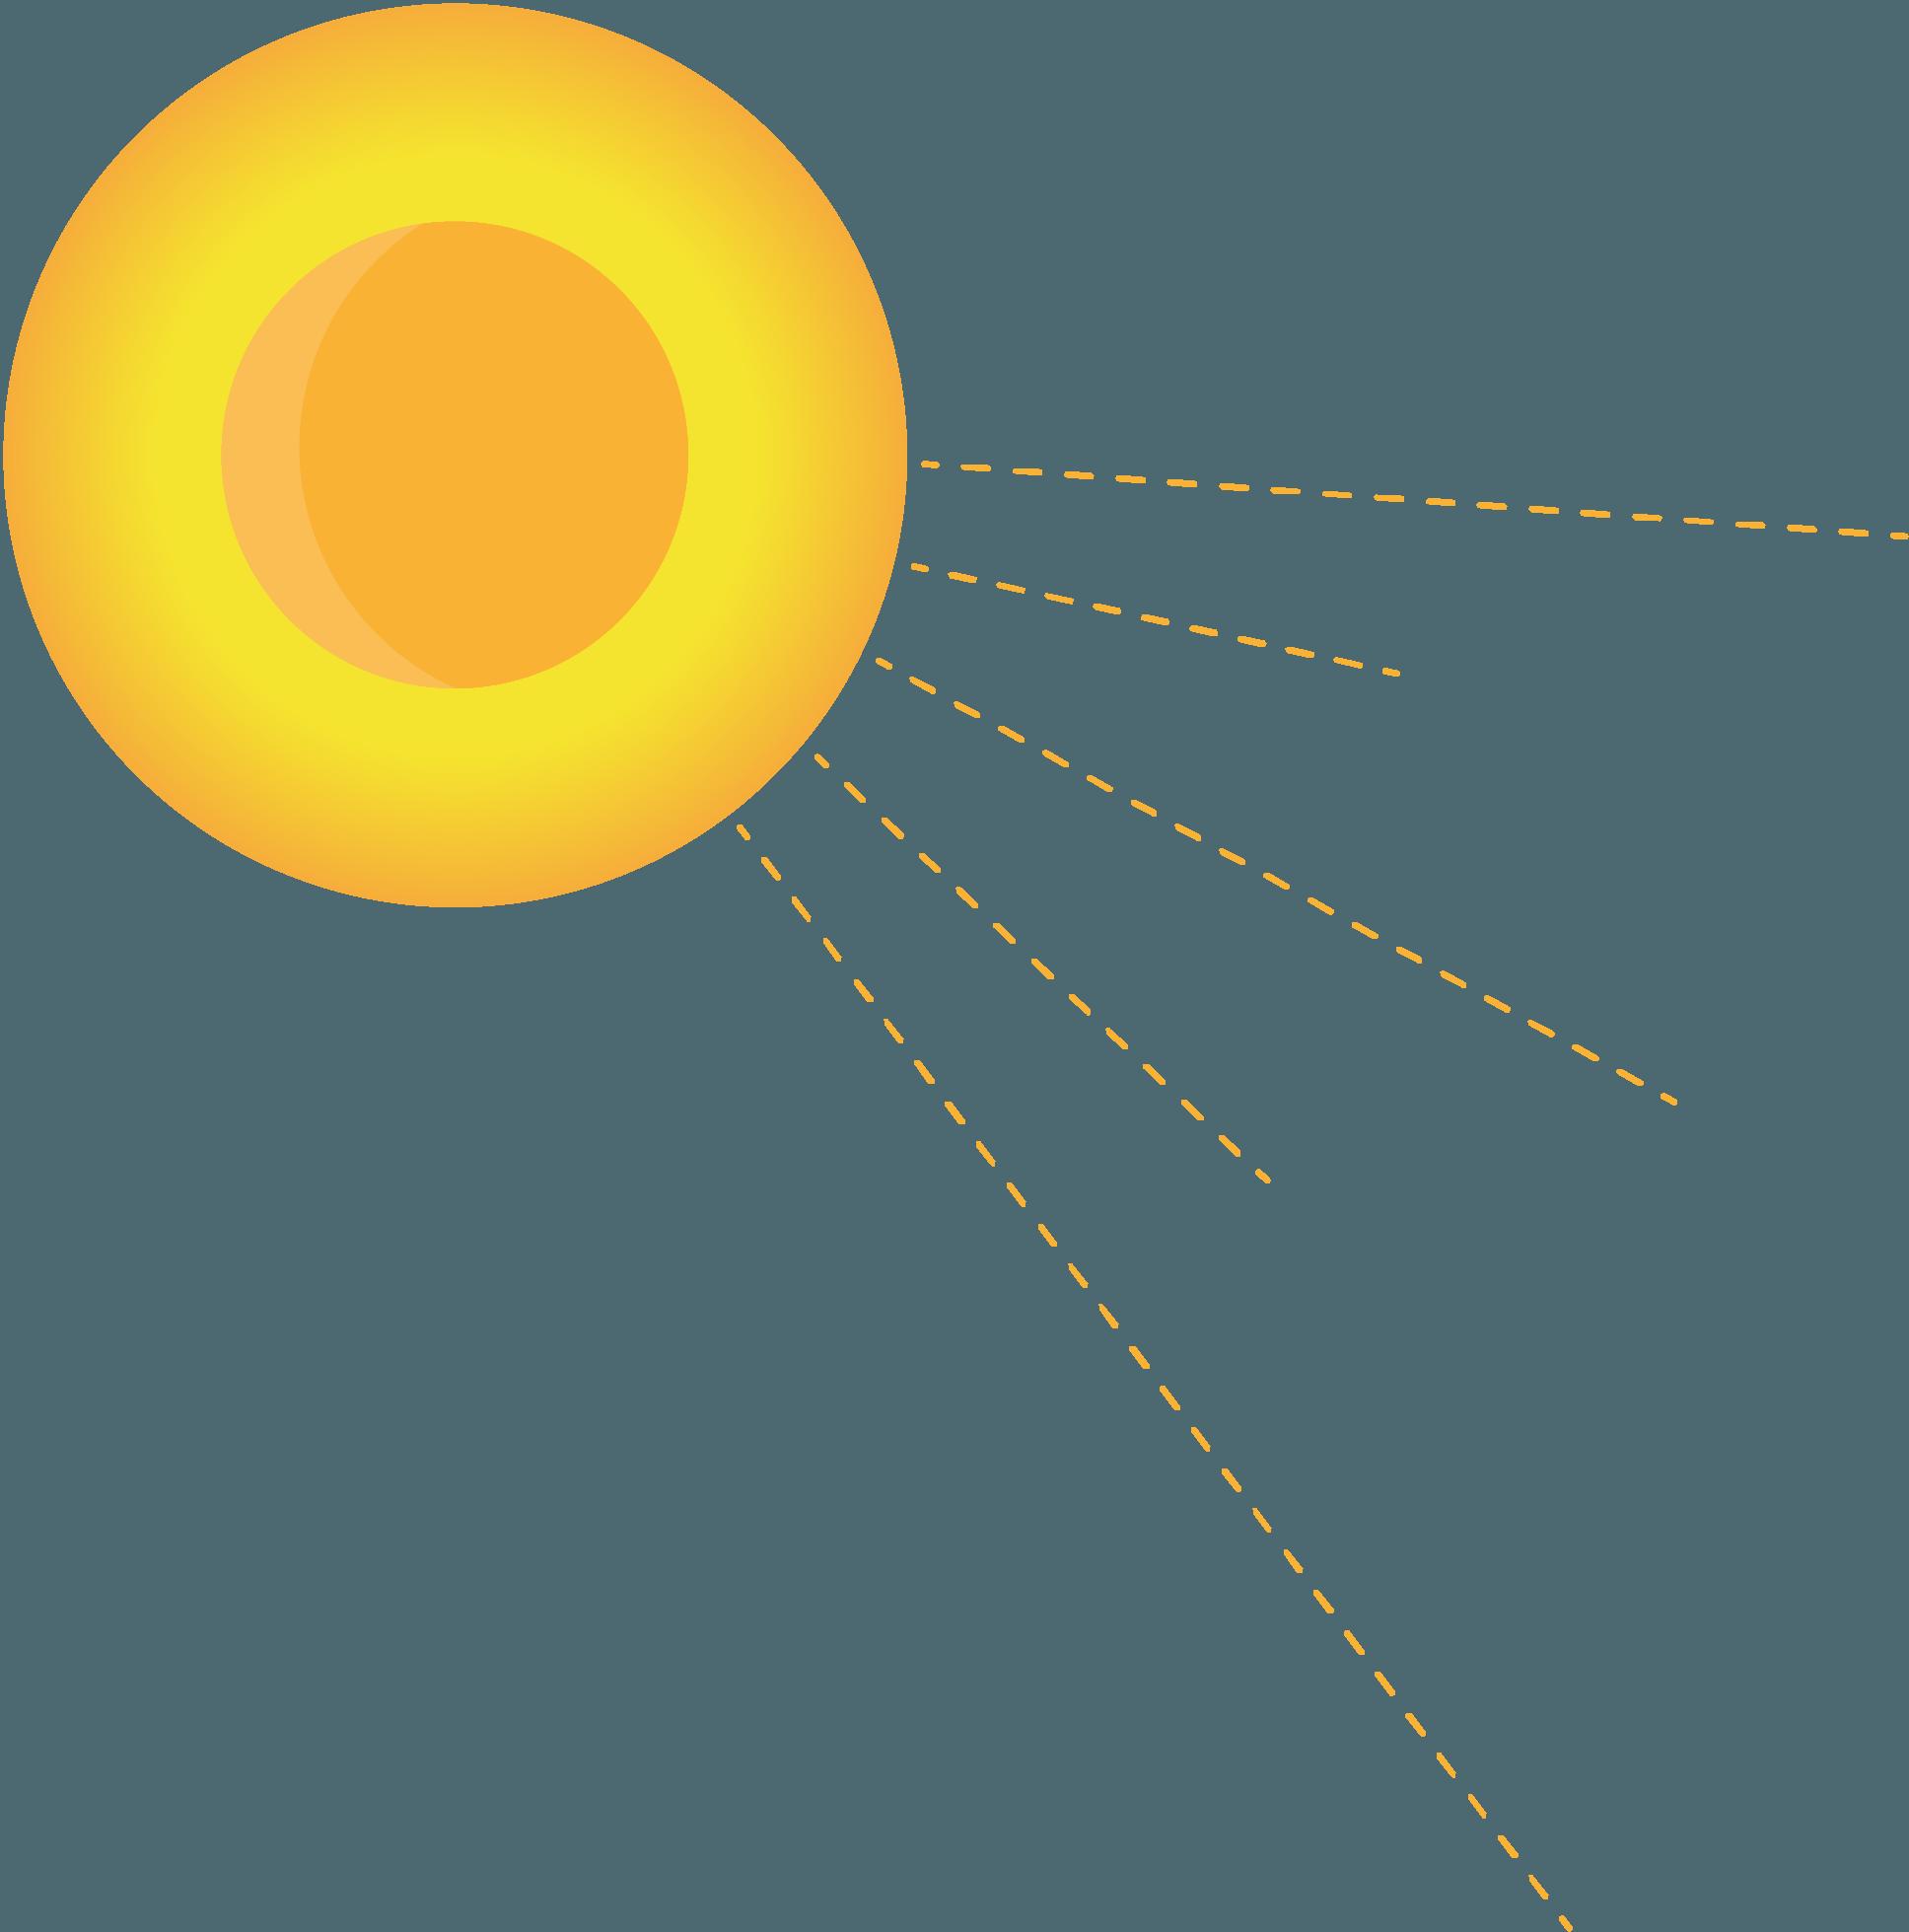 Sun graphic